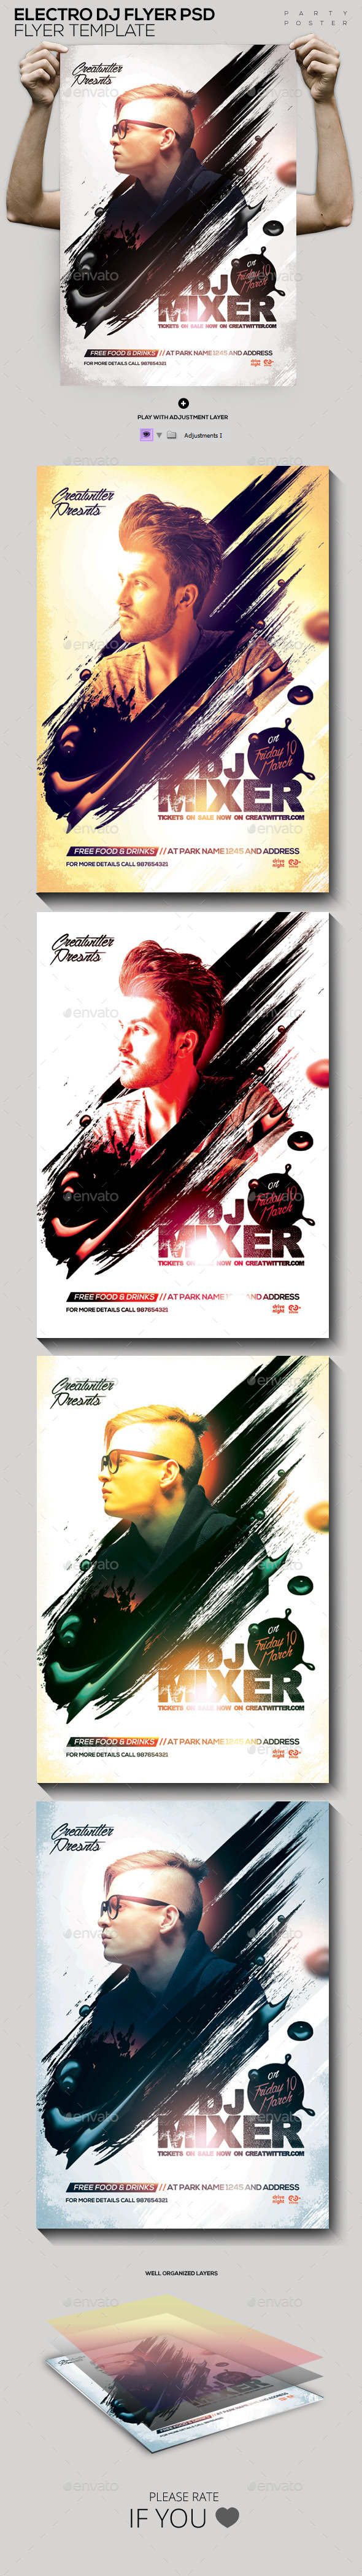 GraphicRiver Electro DJ Flyer PSD 11882941